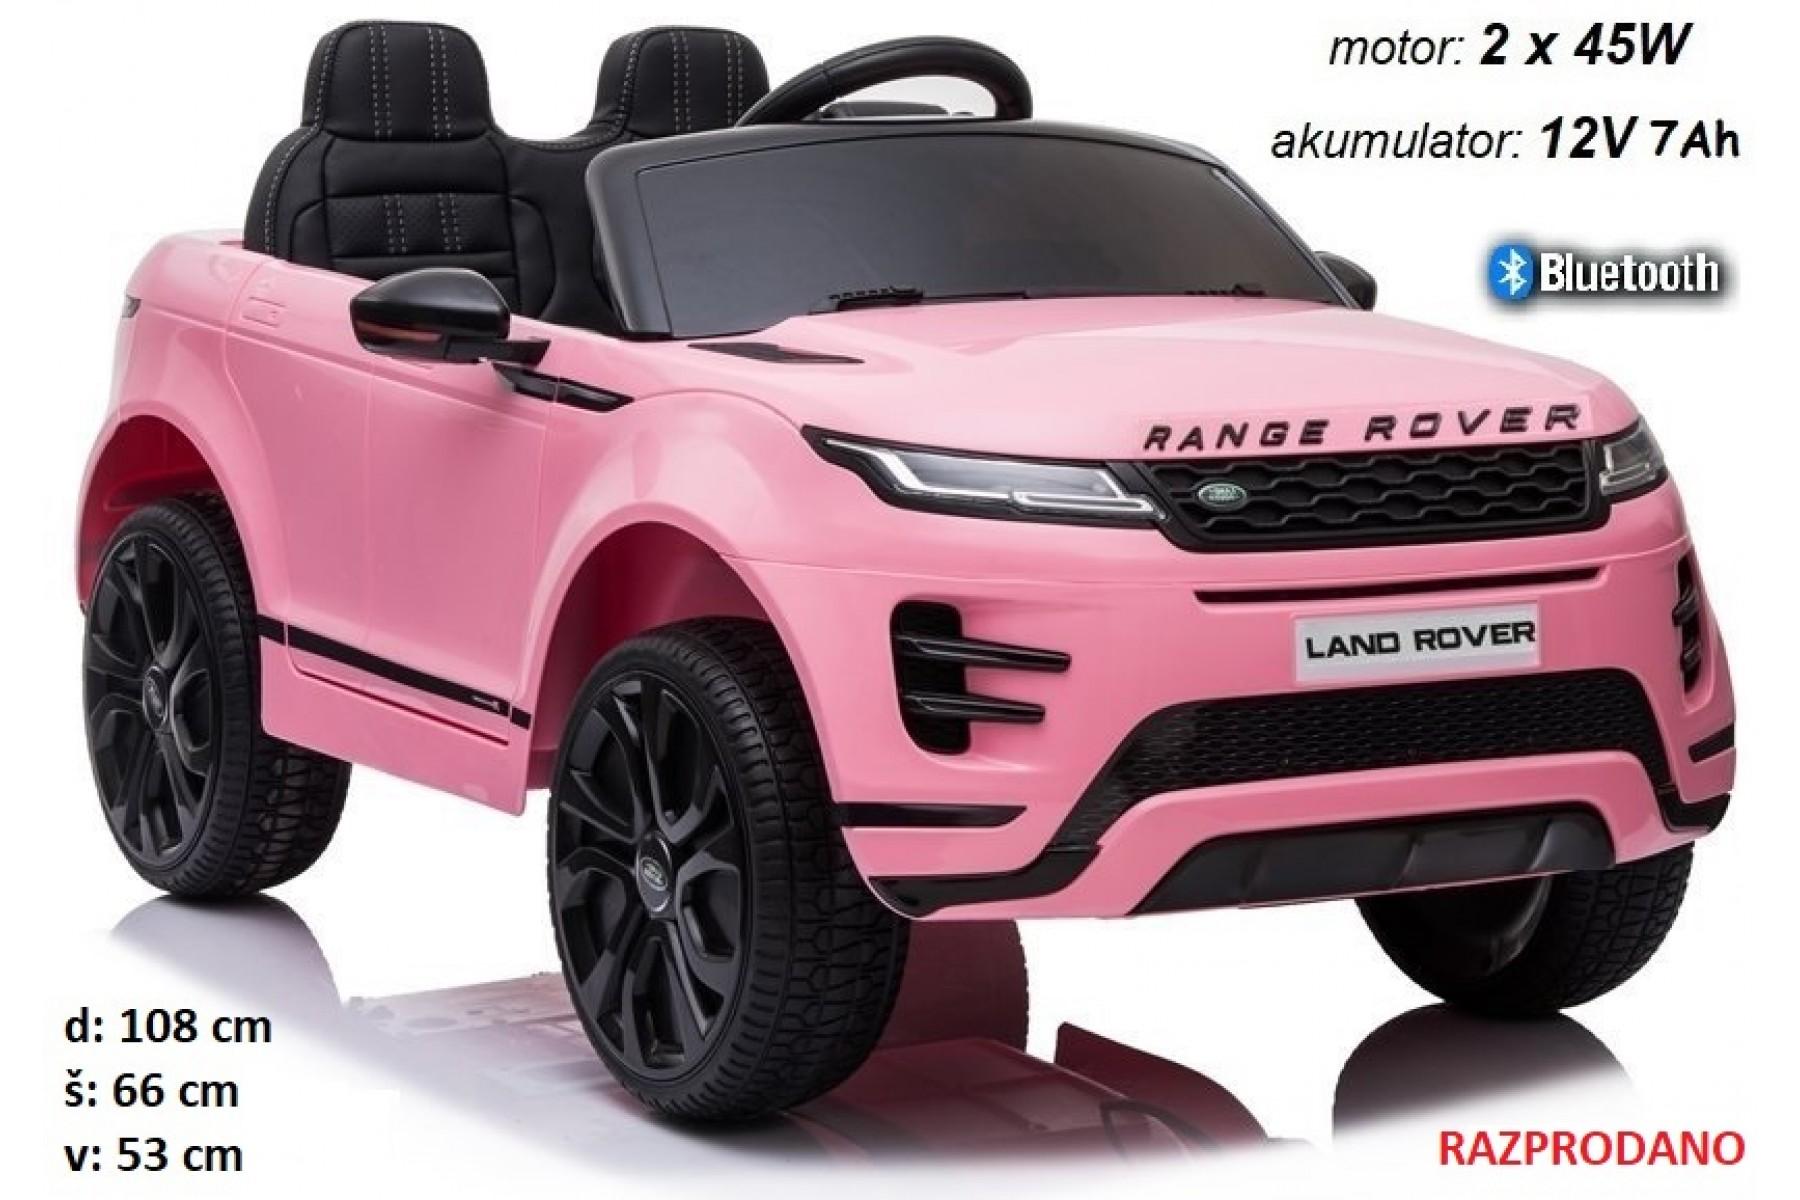 Range Rover Evoque (roza) Bluetooth